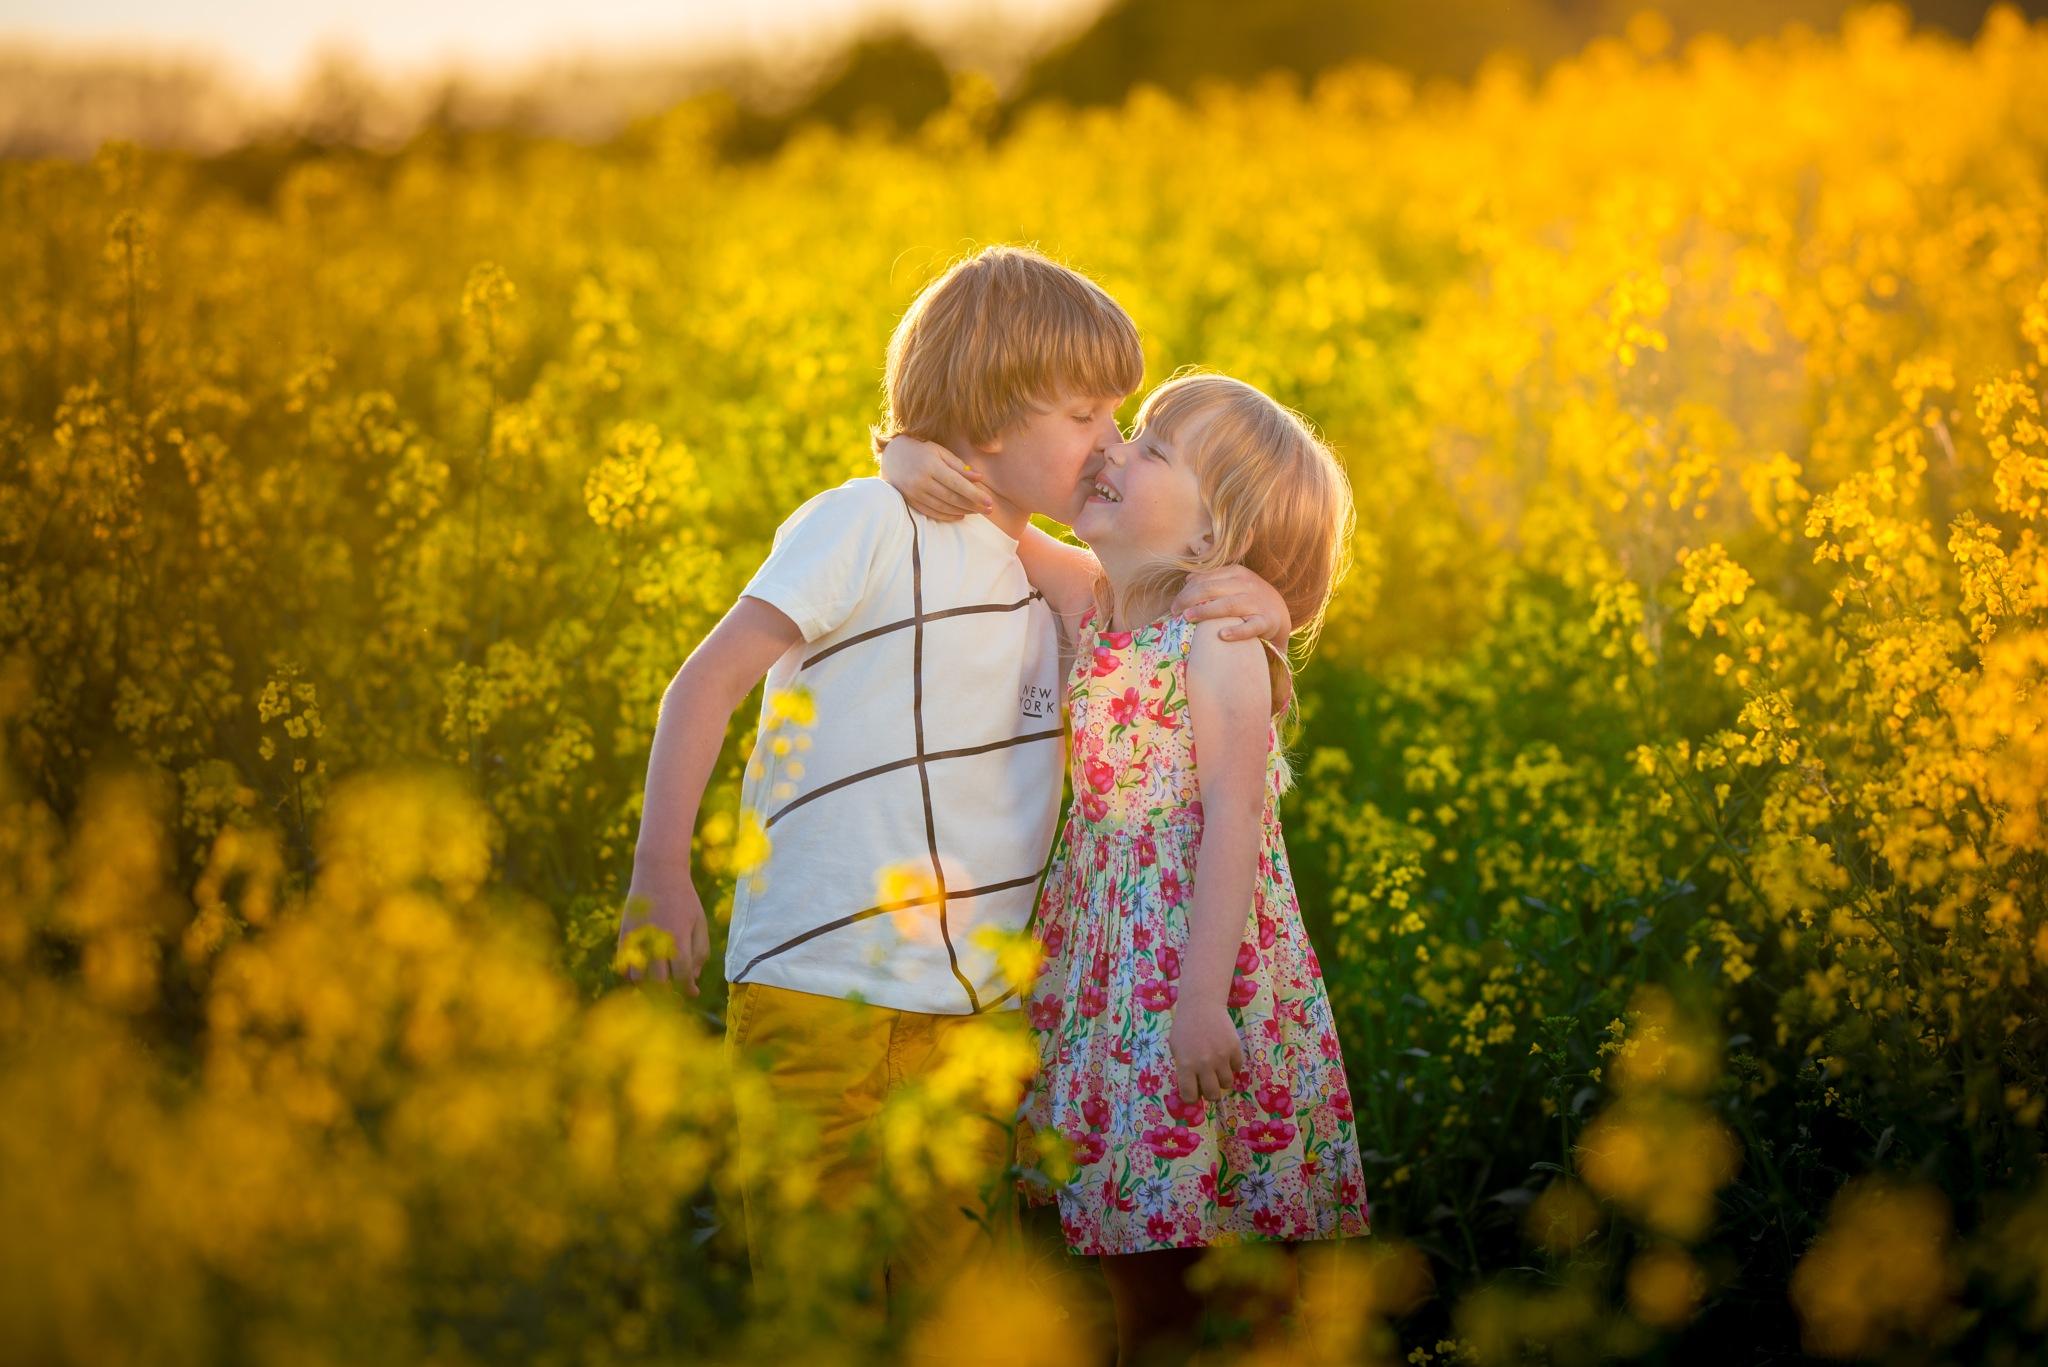 Sibling love by nejmil